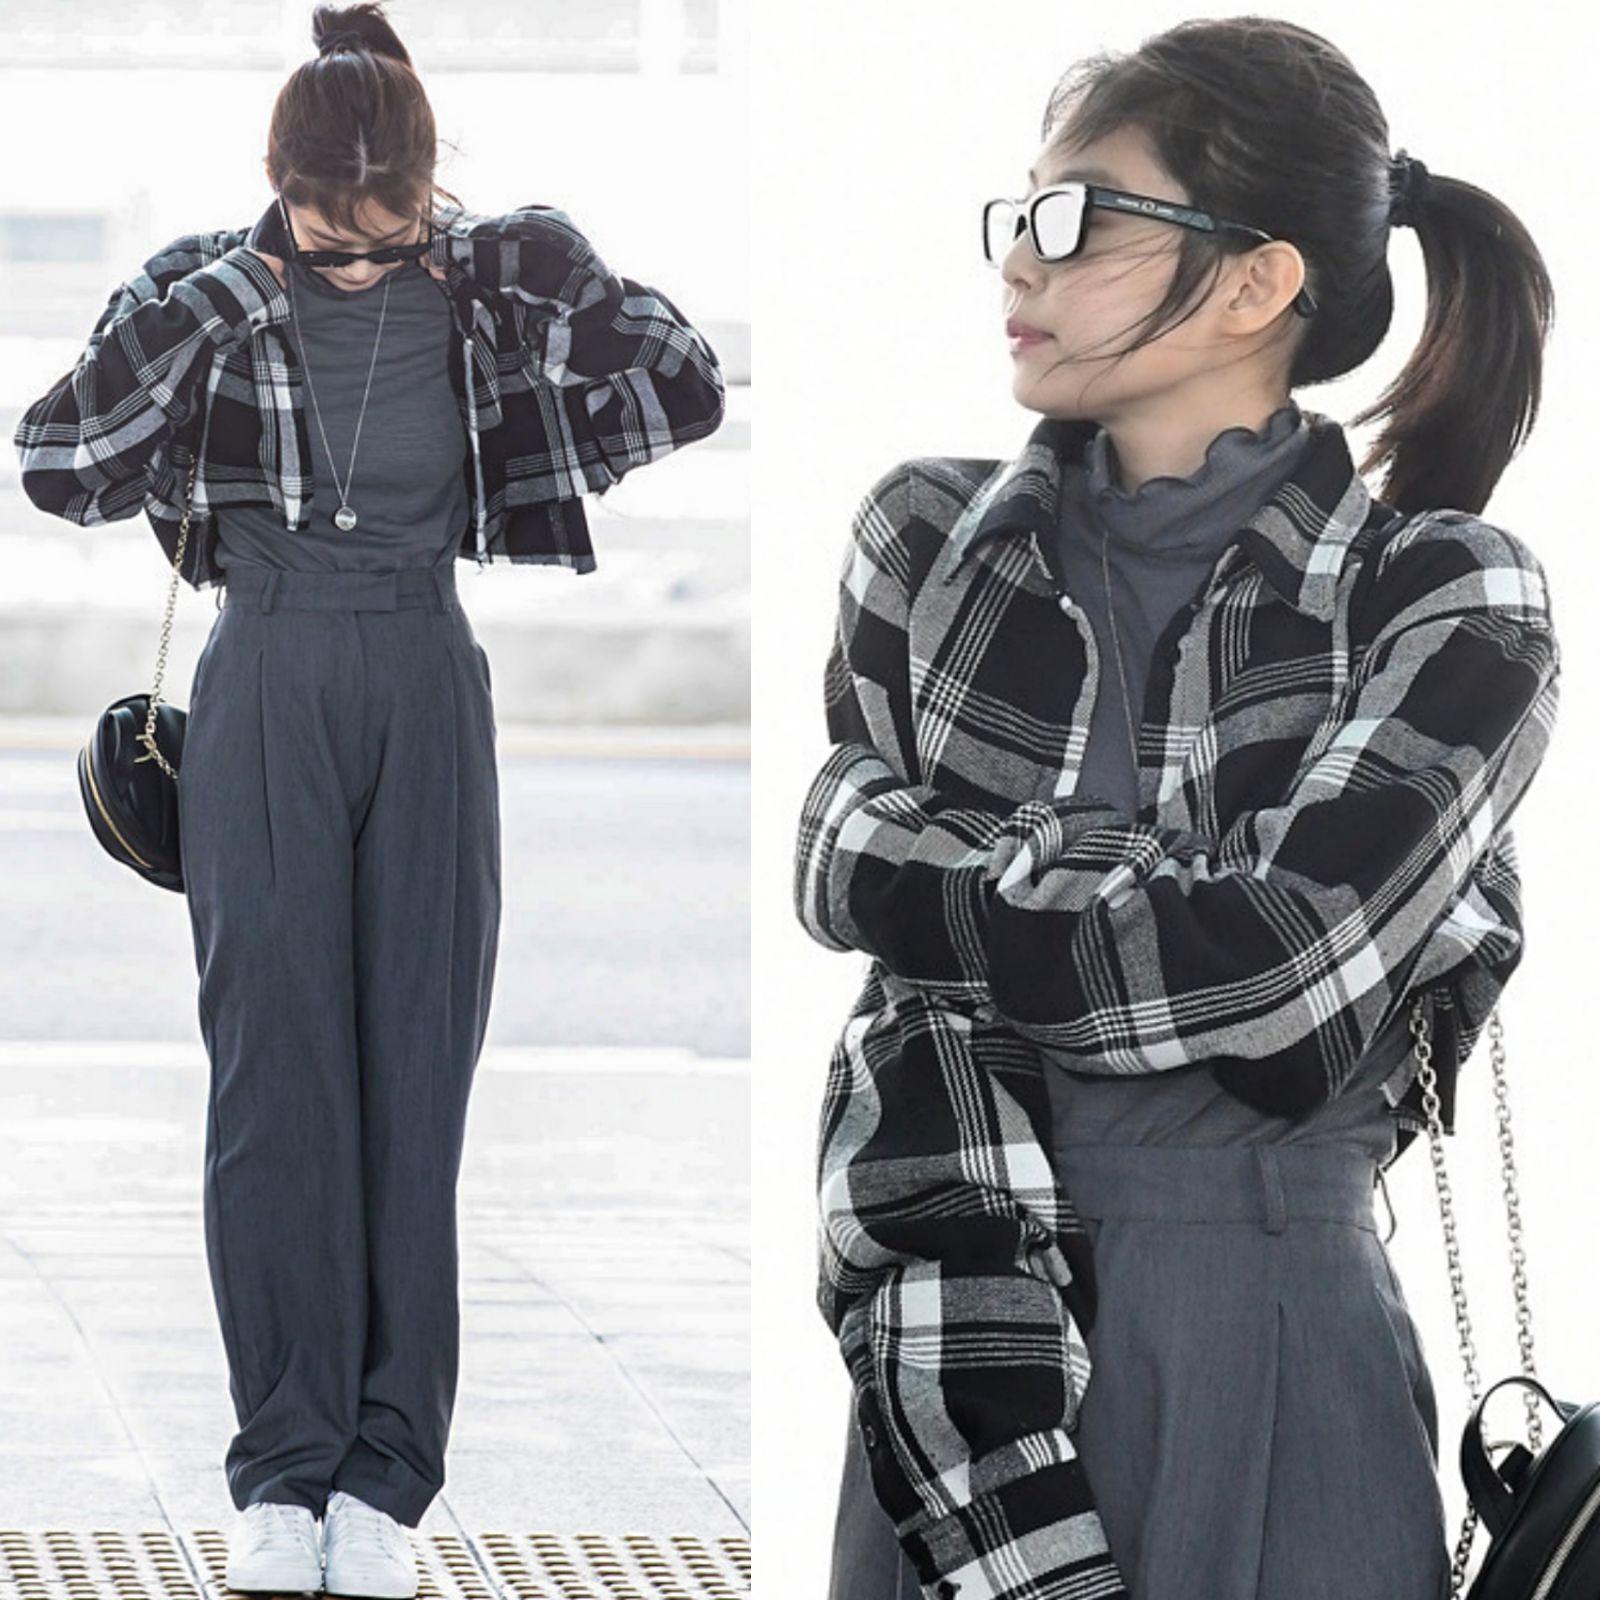 Kpop BLACKPINK JENNIE Korean Retro Plaid Lapel Short Shirt +gray Turtleneck Long Sleeved T Shirt Loose Pants Trousers Women Set